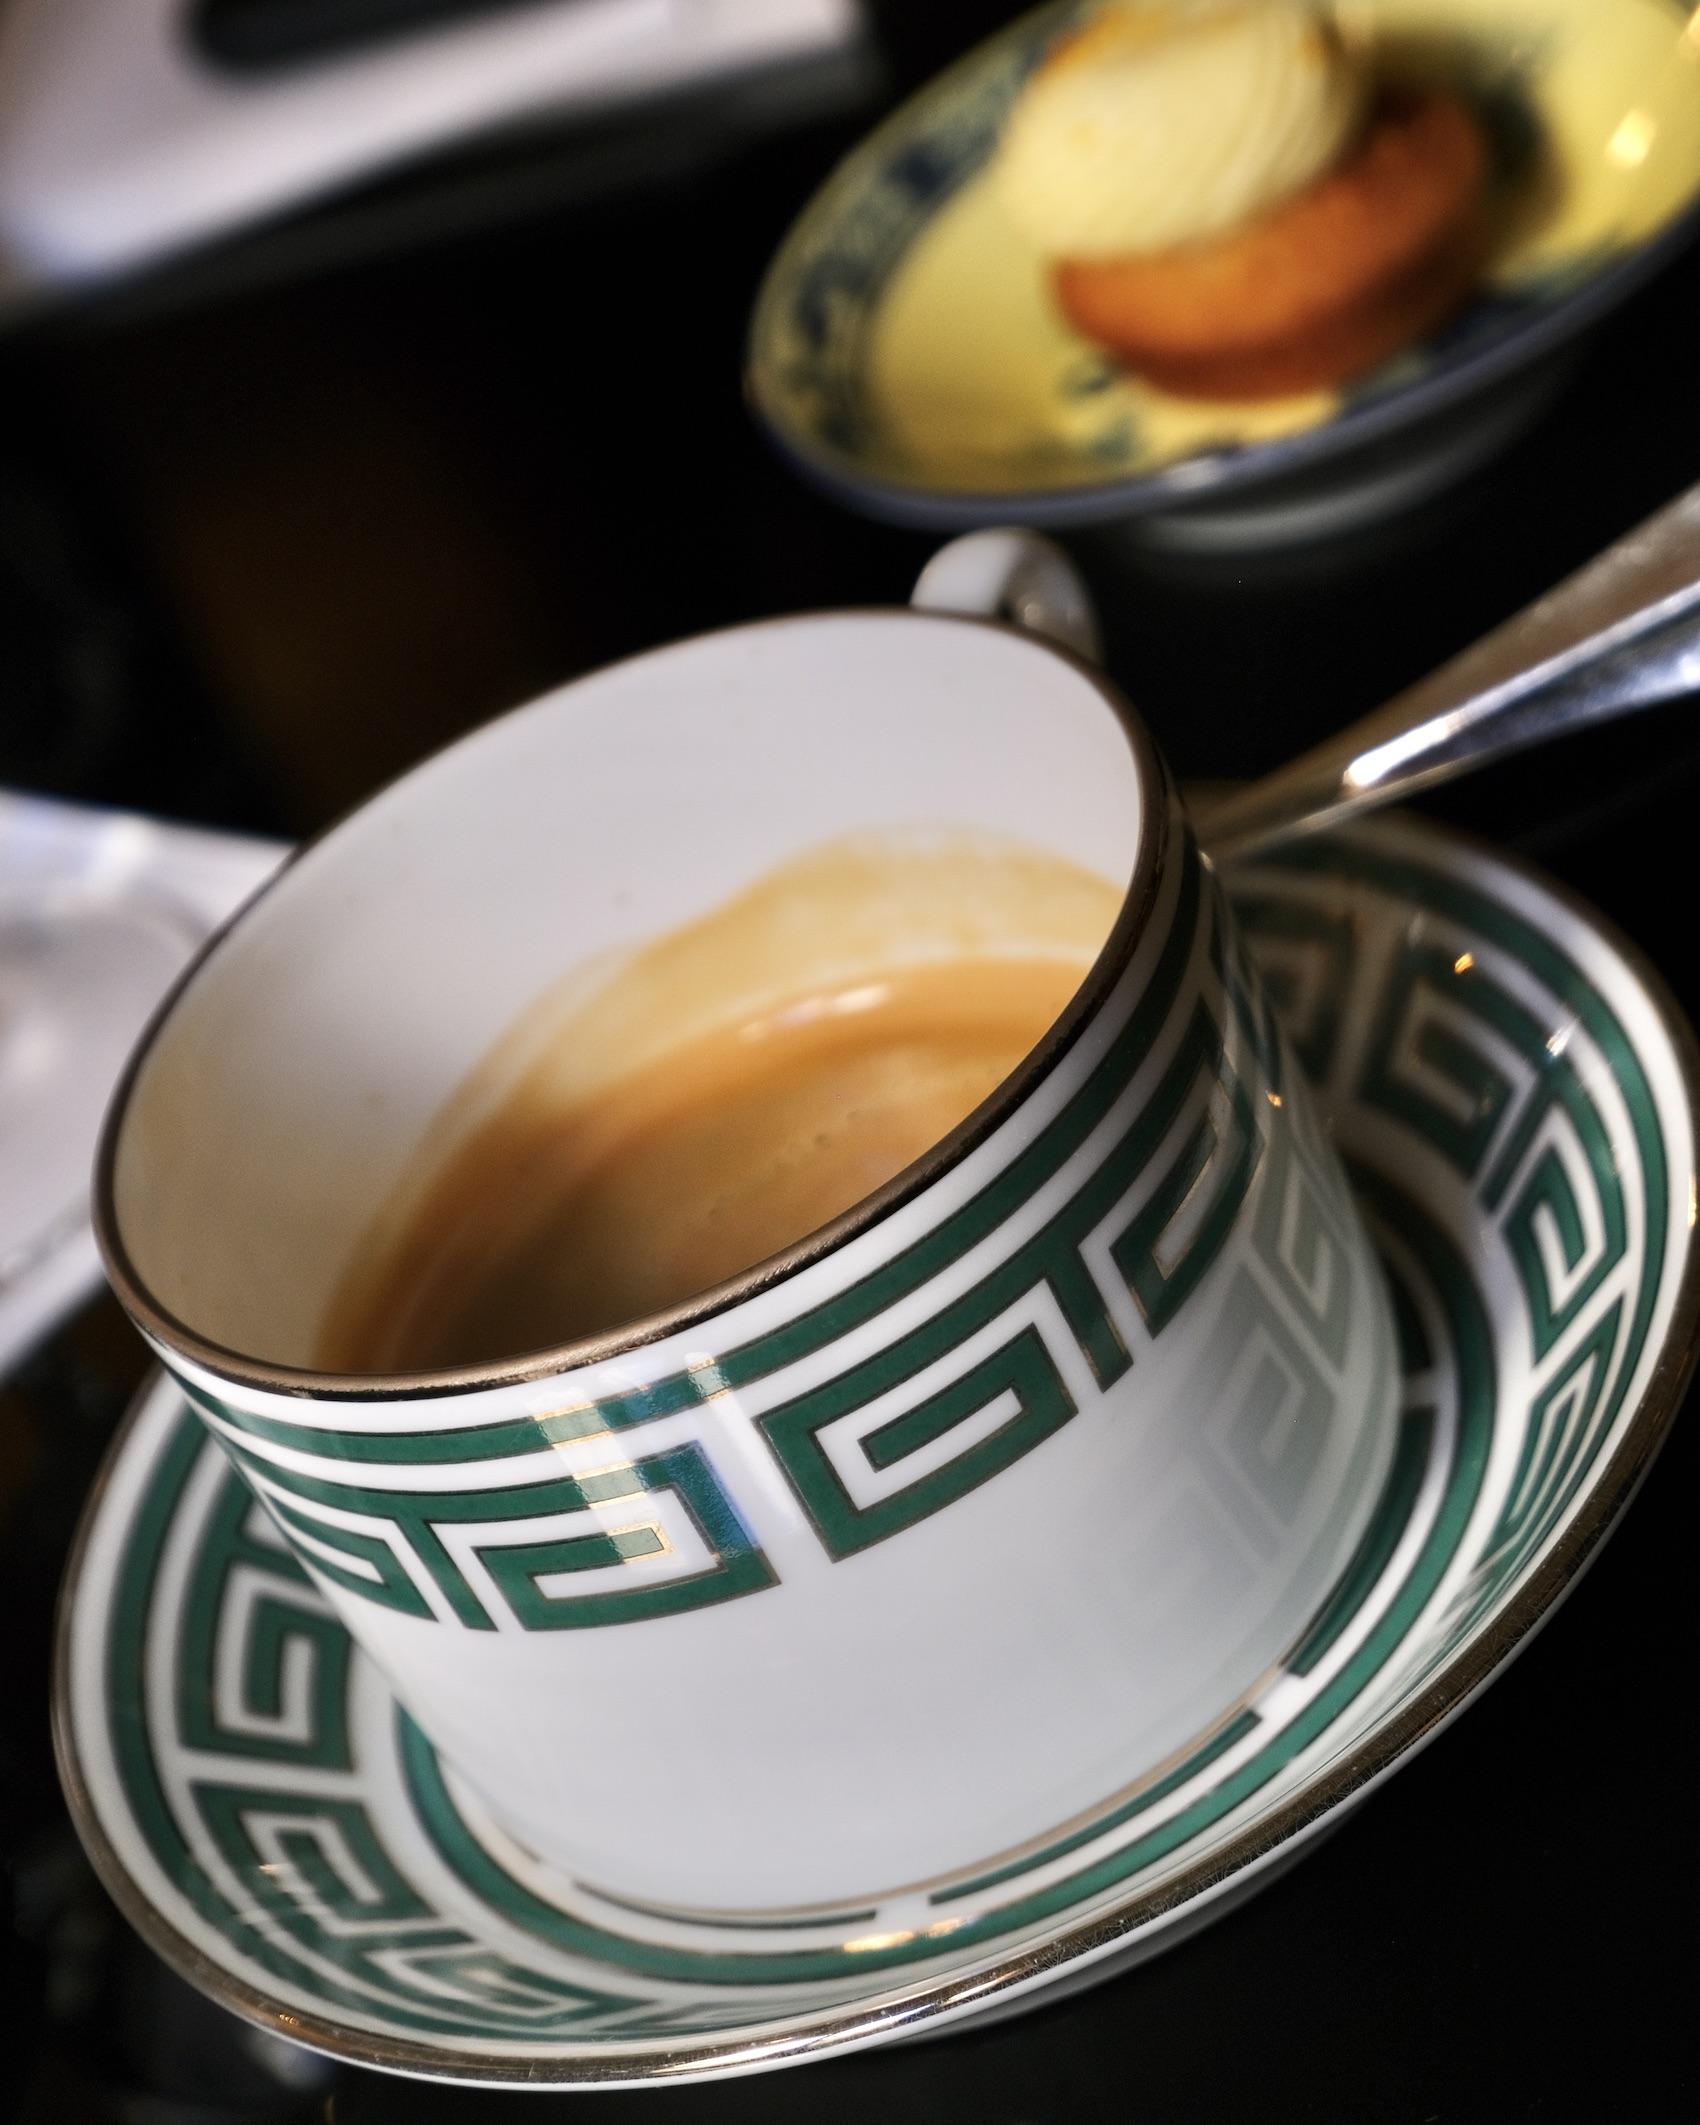 JK Place Espresso